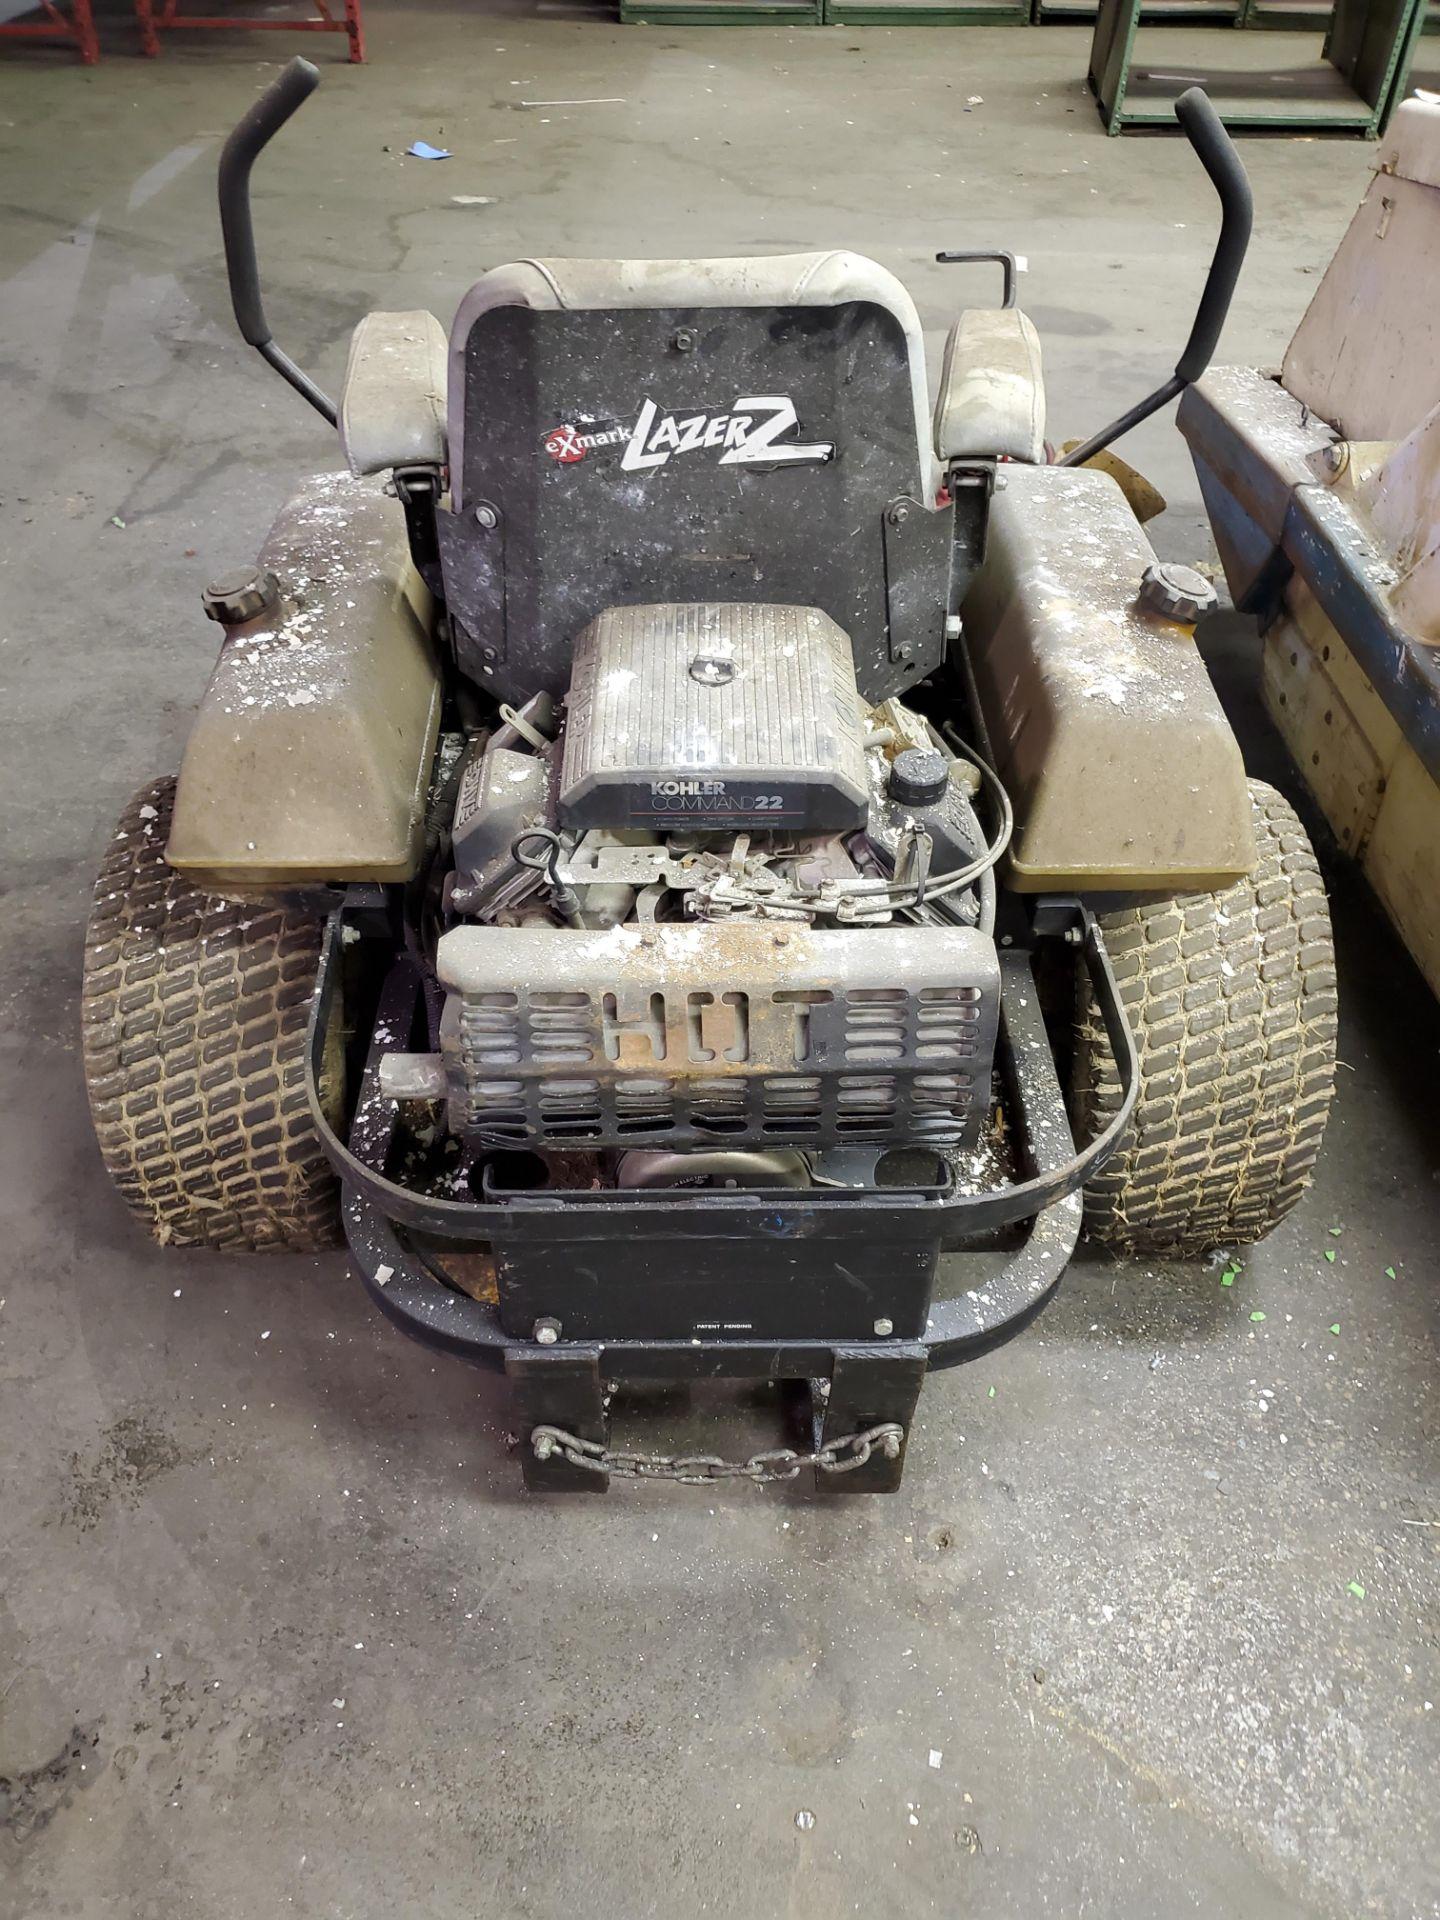 "Exmark Lazer Z Zero Turn Mower w/ 54"" Deck, 2117 Hours, Not in Service - Image 2 of 5"